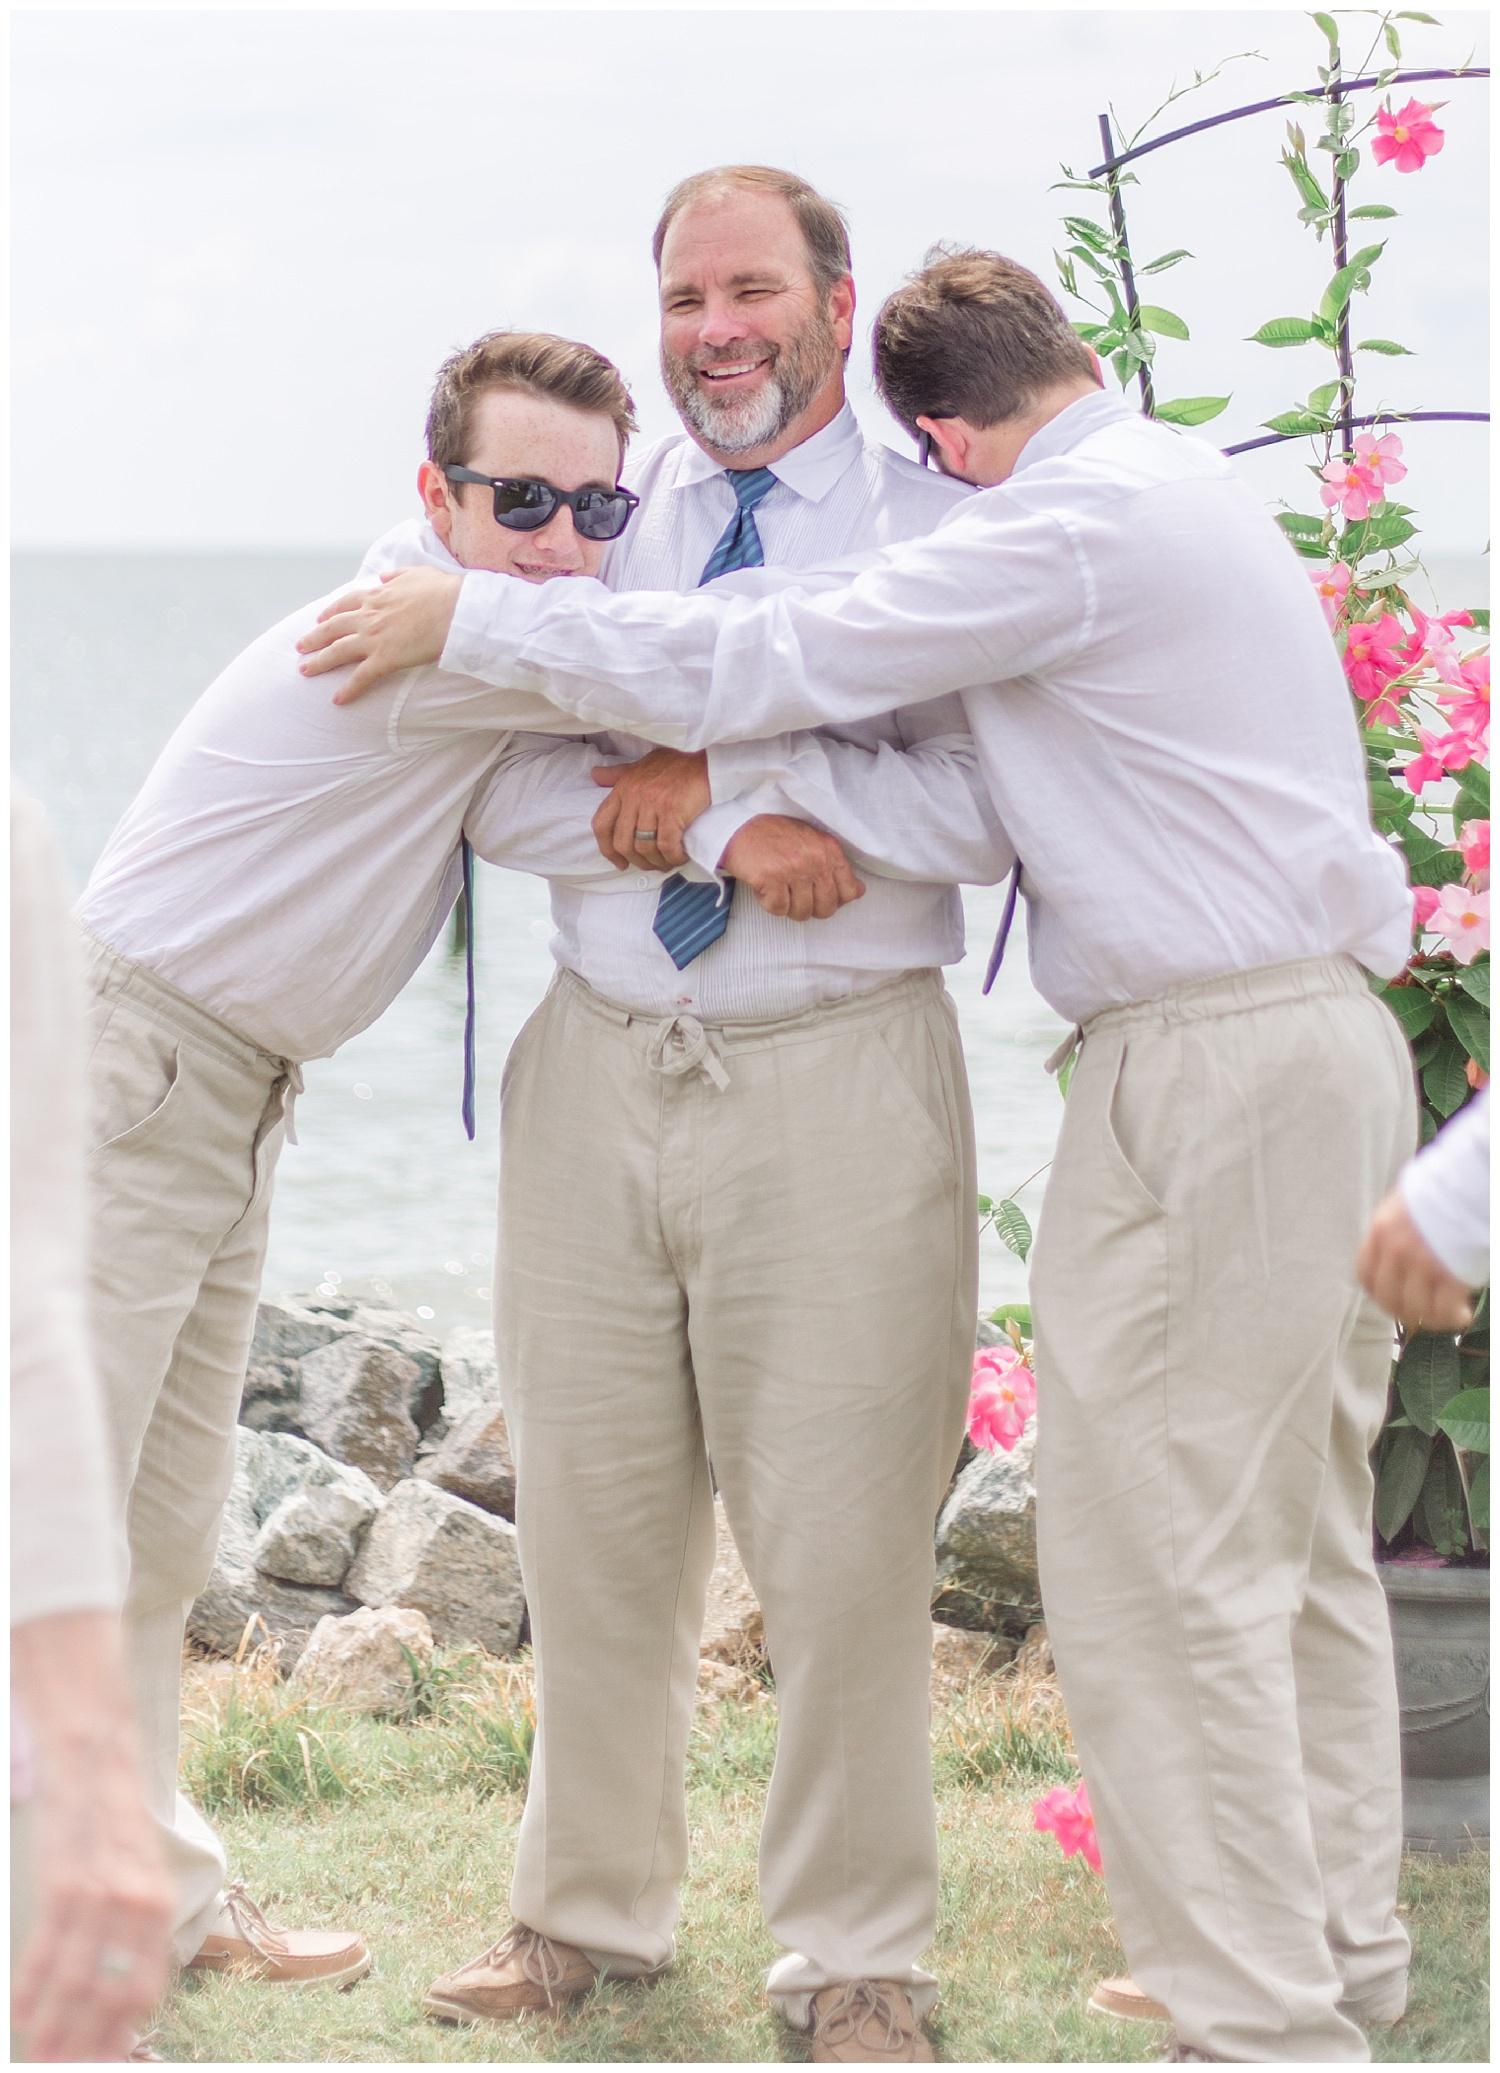 Deltaville Wedding by the Water - Joni + Ken